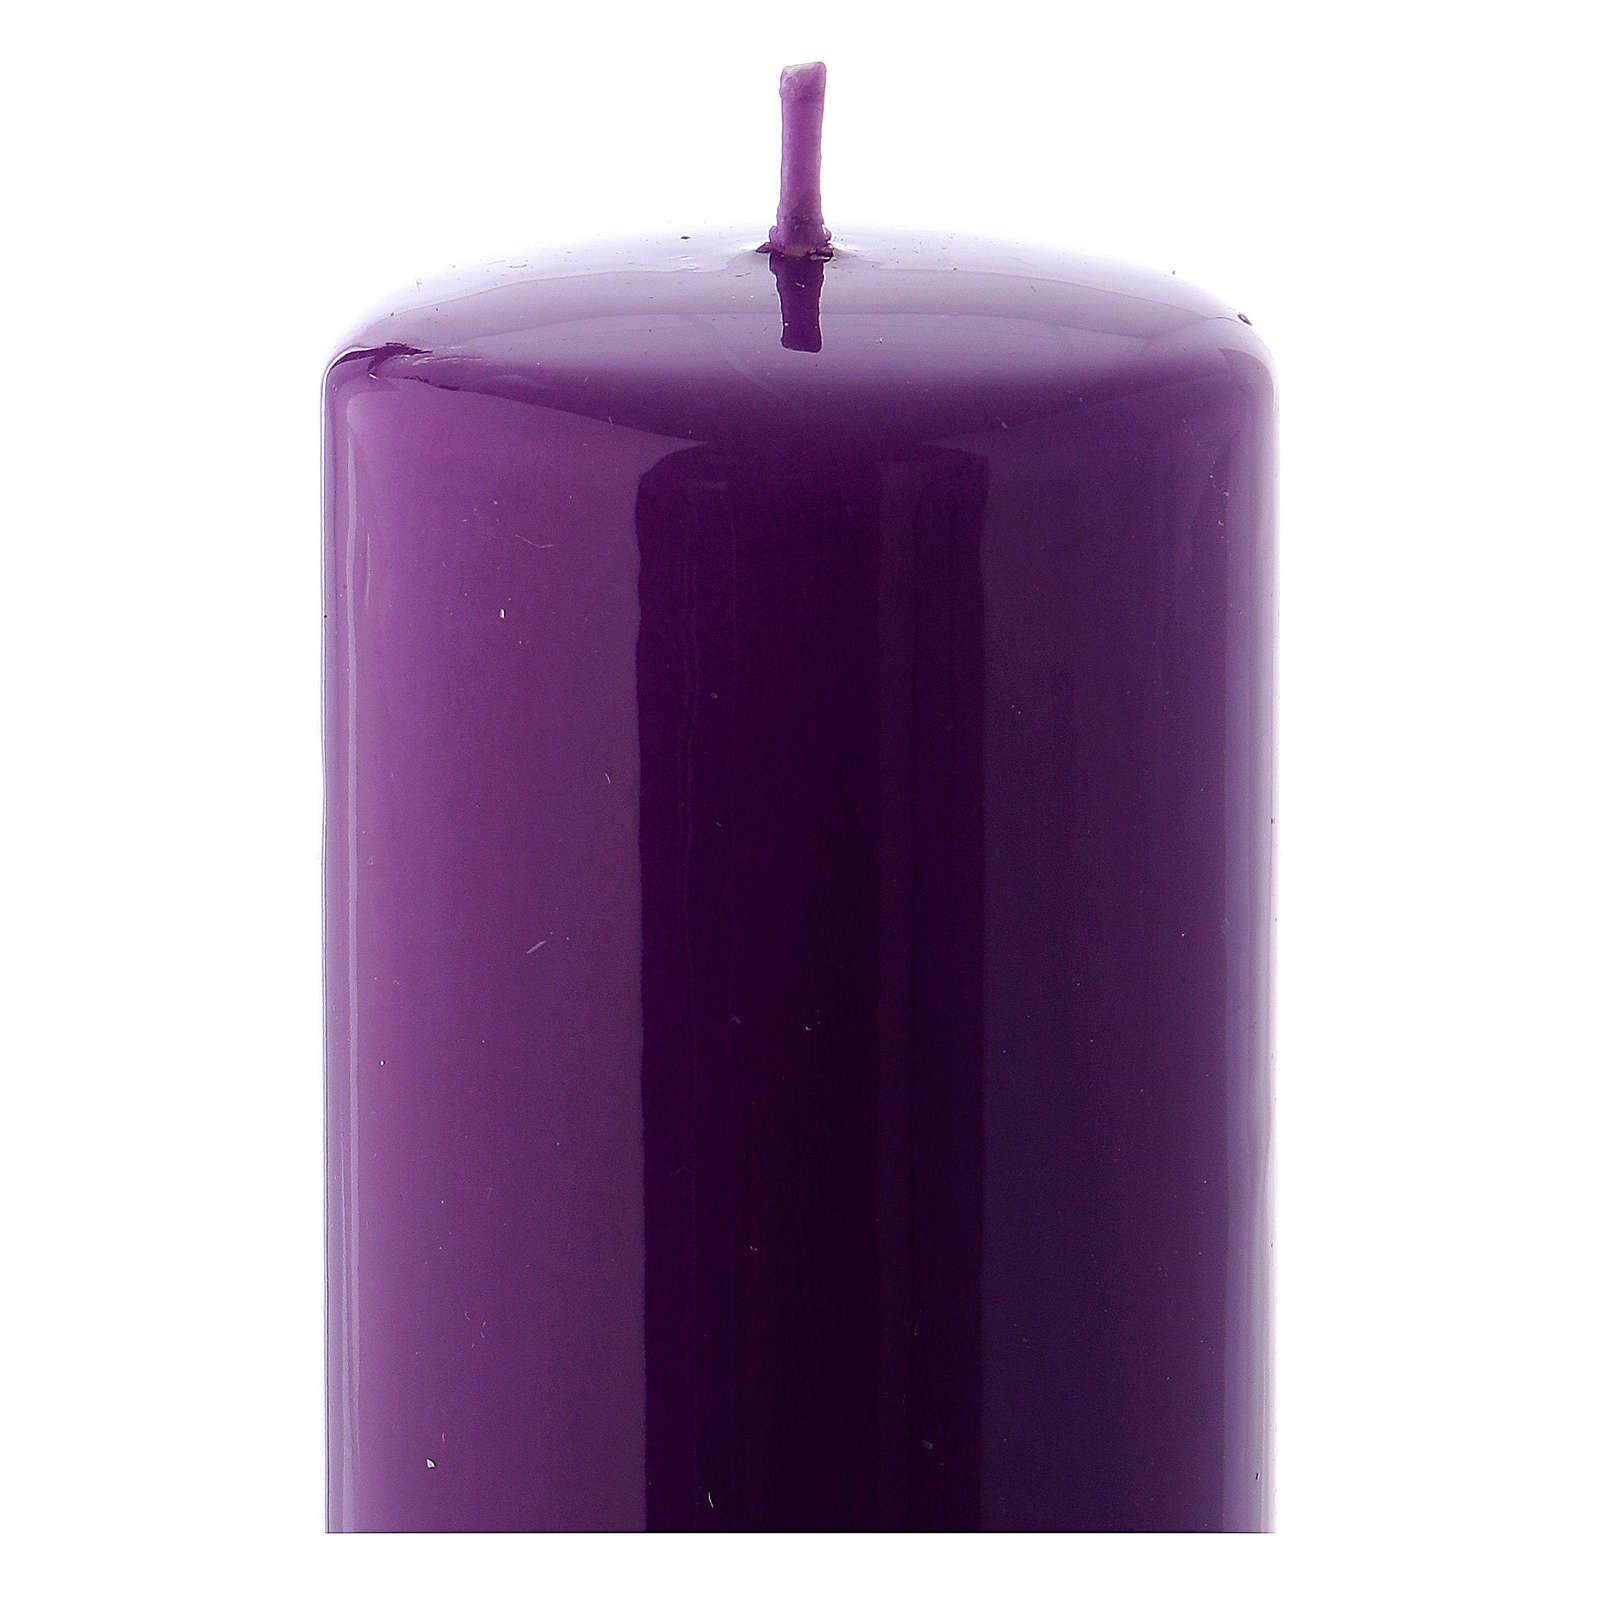 Ceralacca purple wax candle 6x15 cm 3